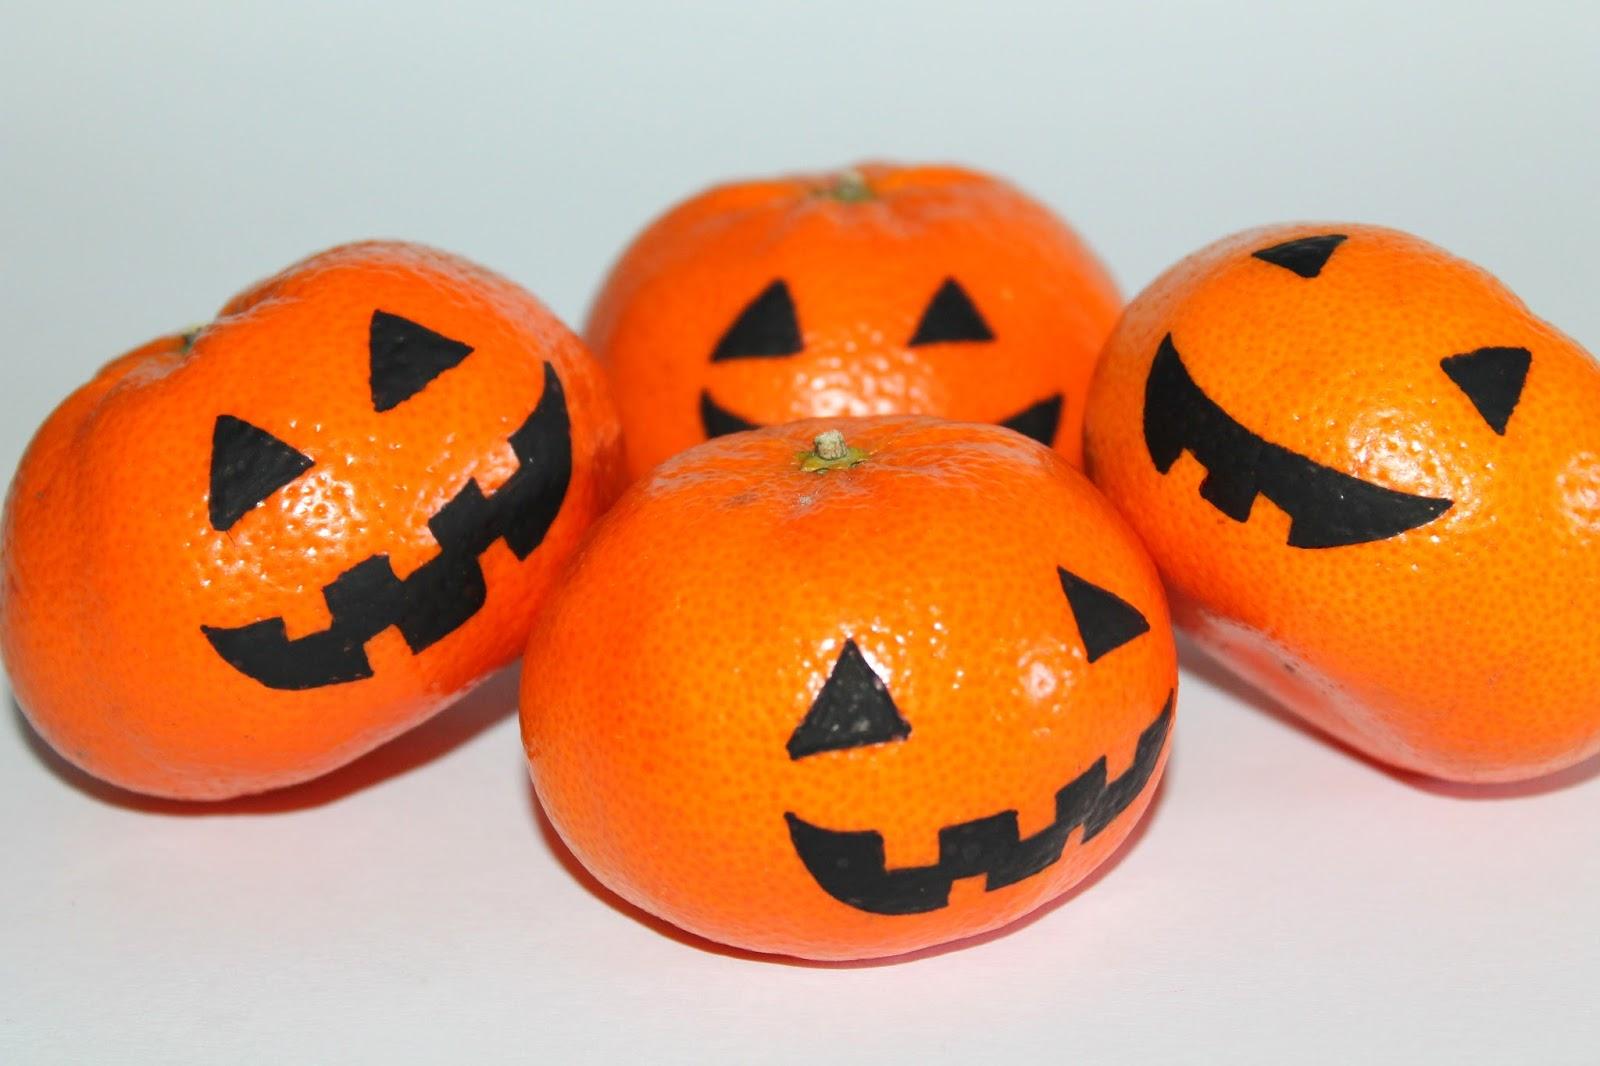 DIY, Basteln: Halloween Mandarinen in Halloween, Herbstdekoration, Basteln mit Naturmaterialien - DIYCarinchen